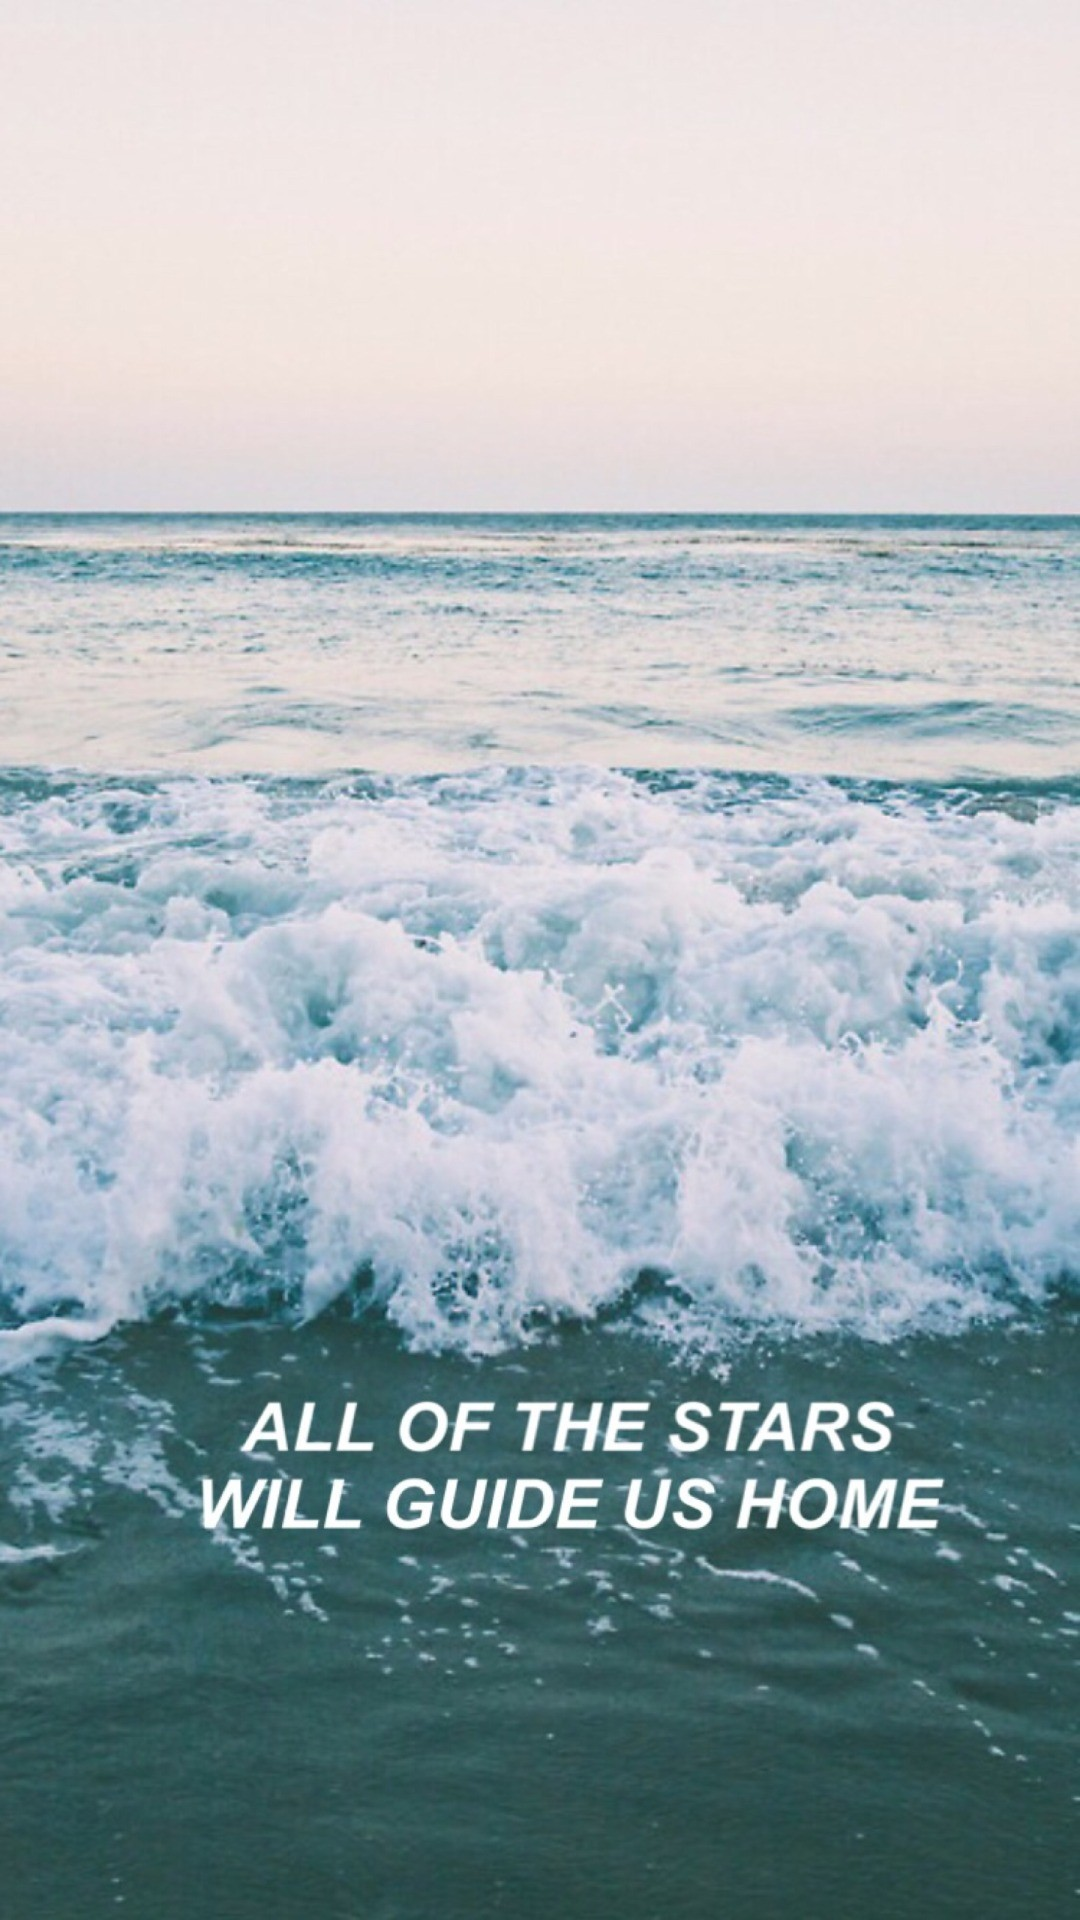 download ed sheeran all of the stars free